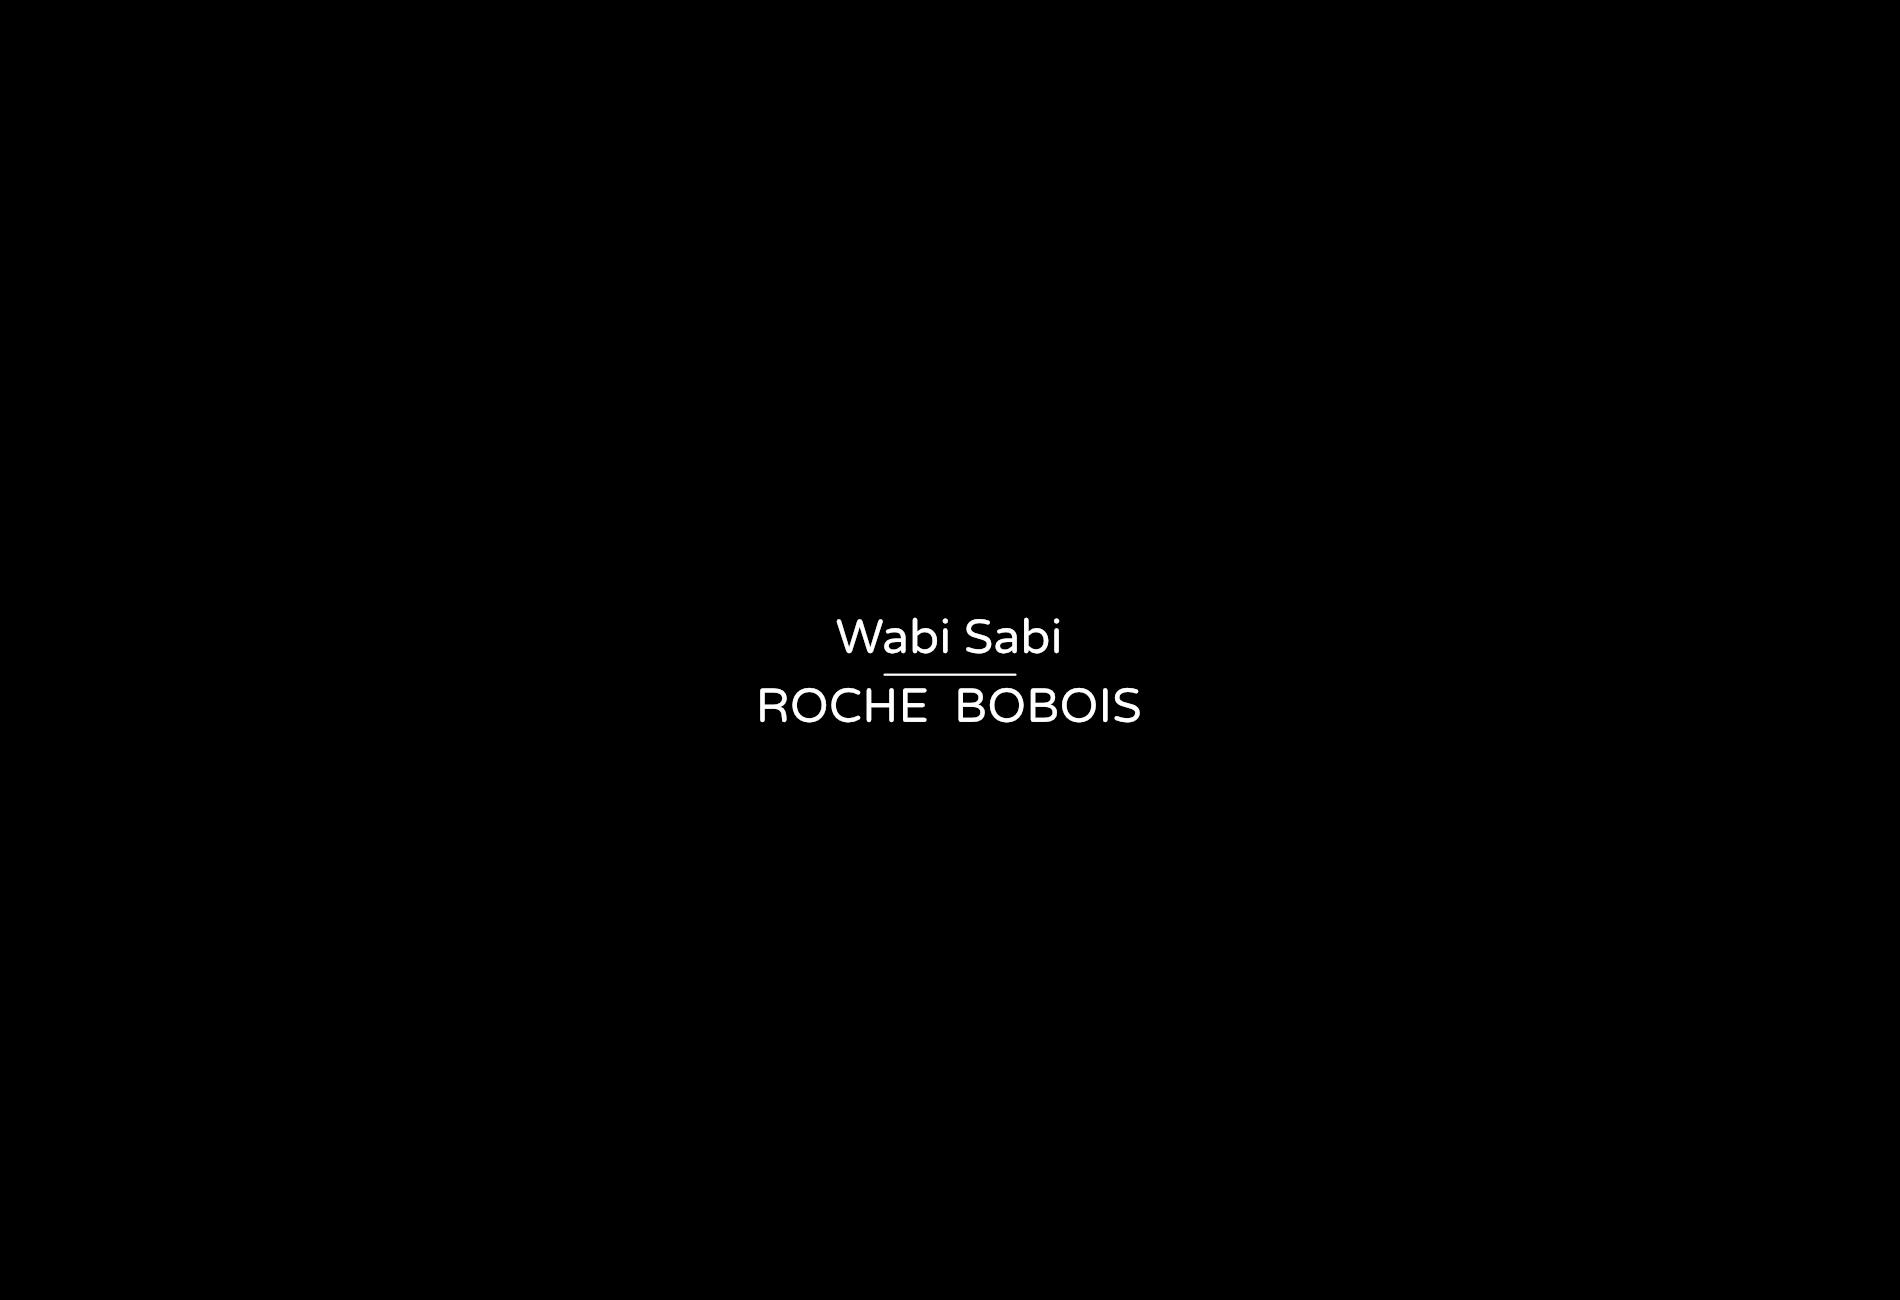 mirror - Denis Guidone Wabi Sabi design Roche Bobois - 00